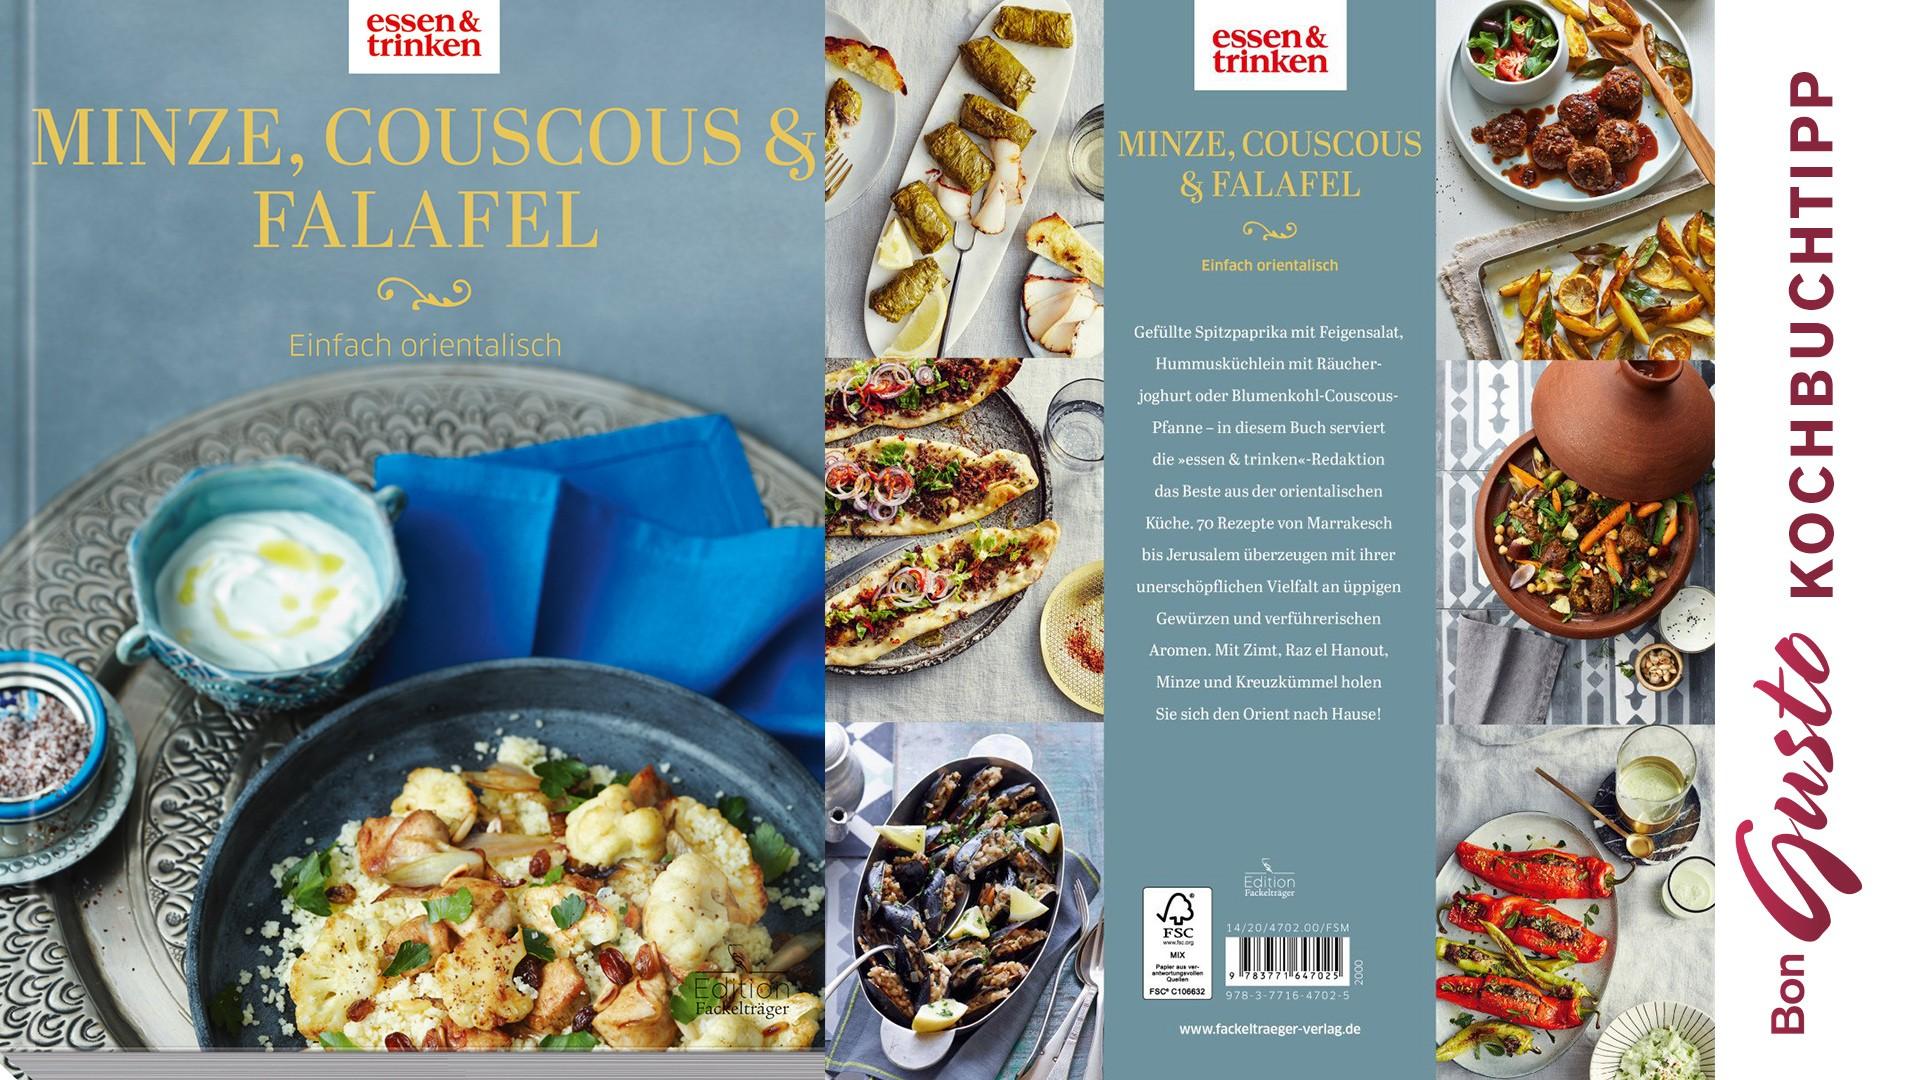 BonGusto Kochbuchtipp: Minze, Couscous & Falafel